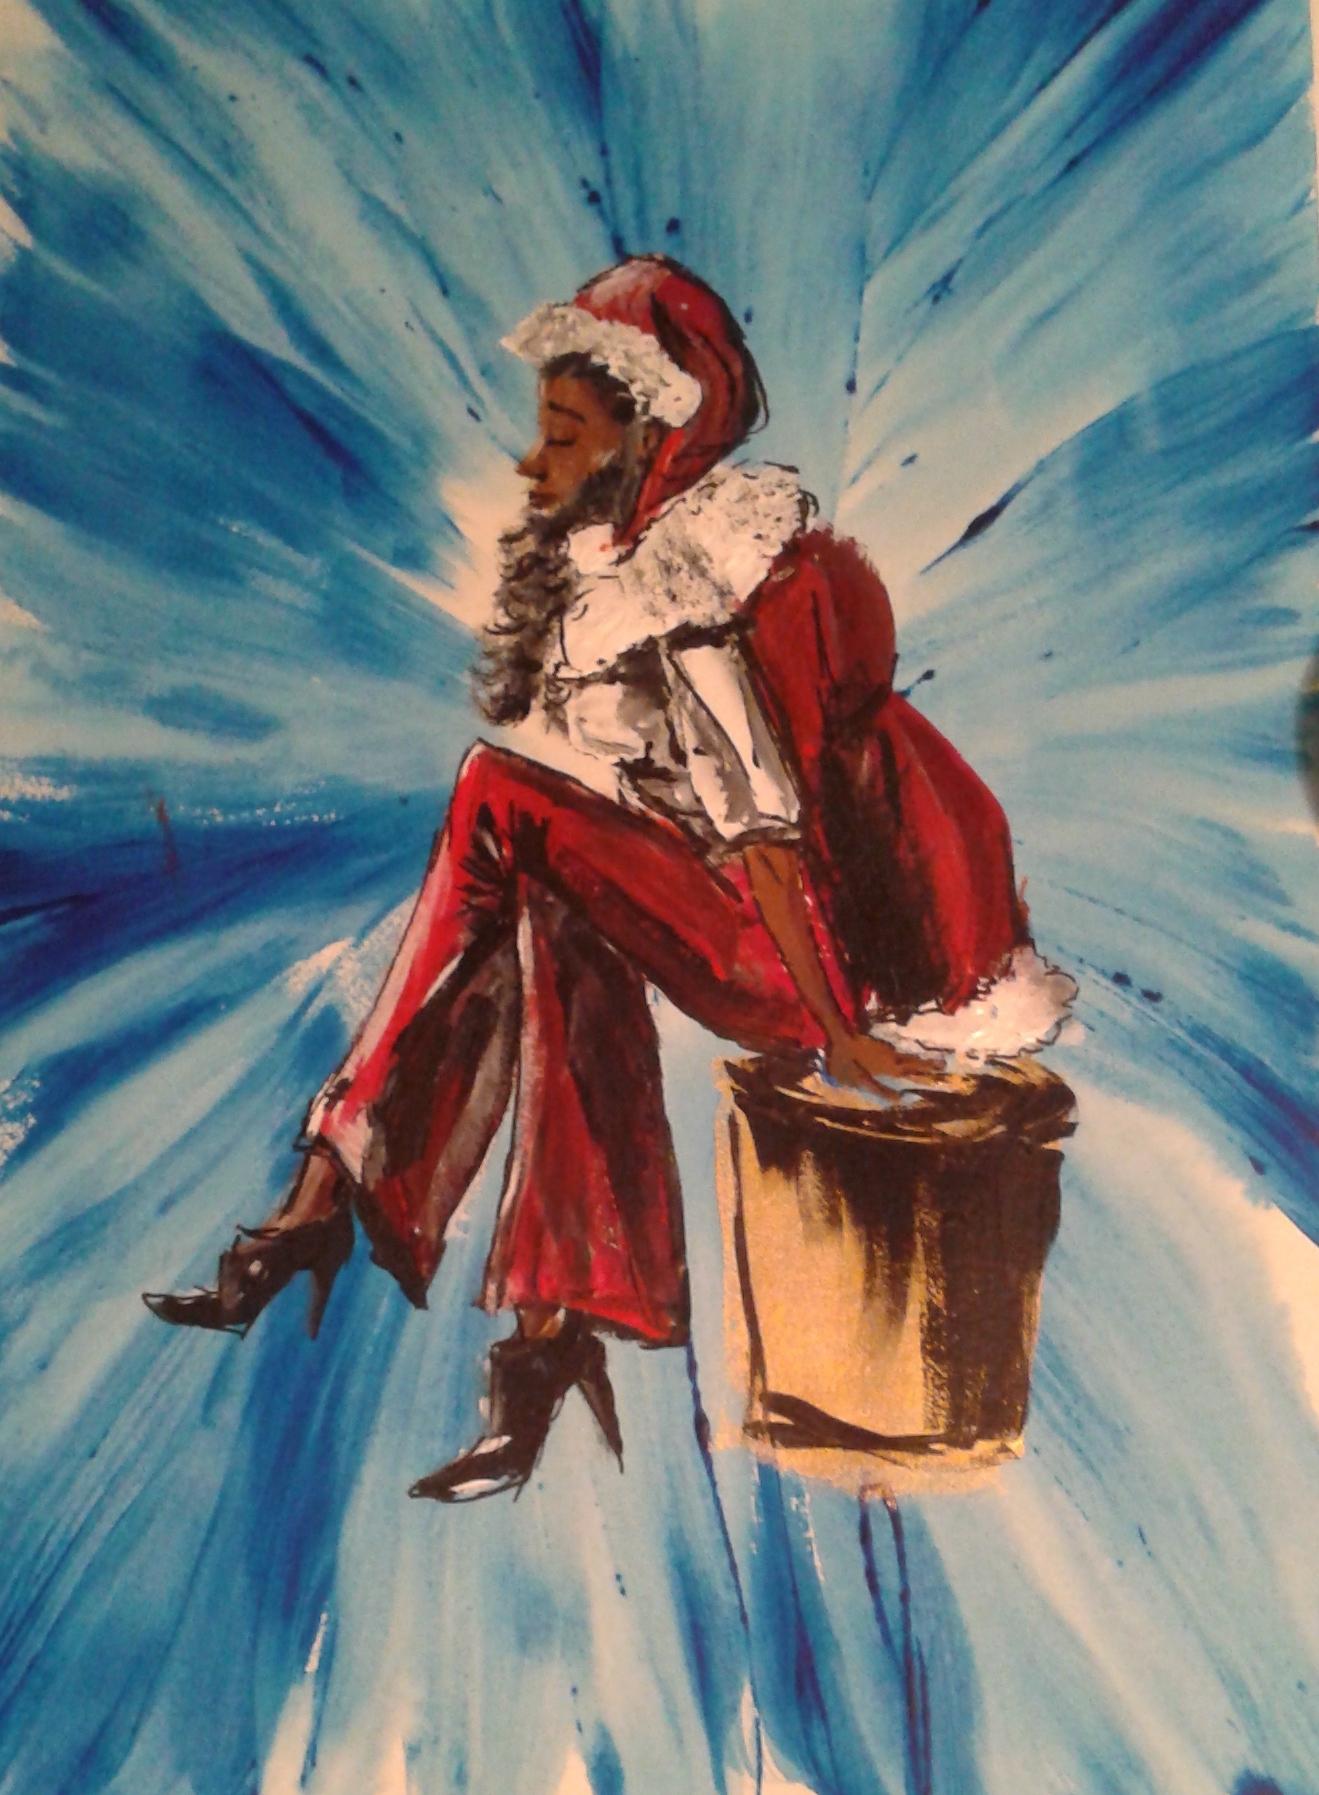 concept image for Santa Claus